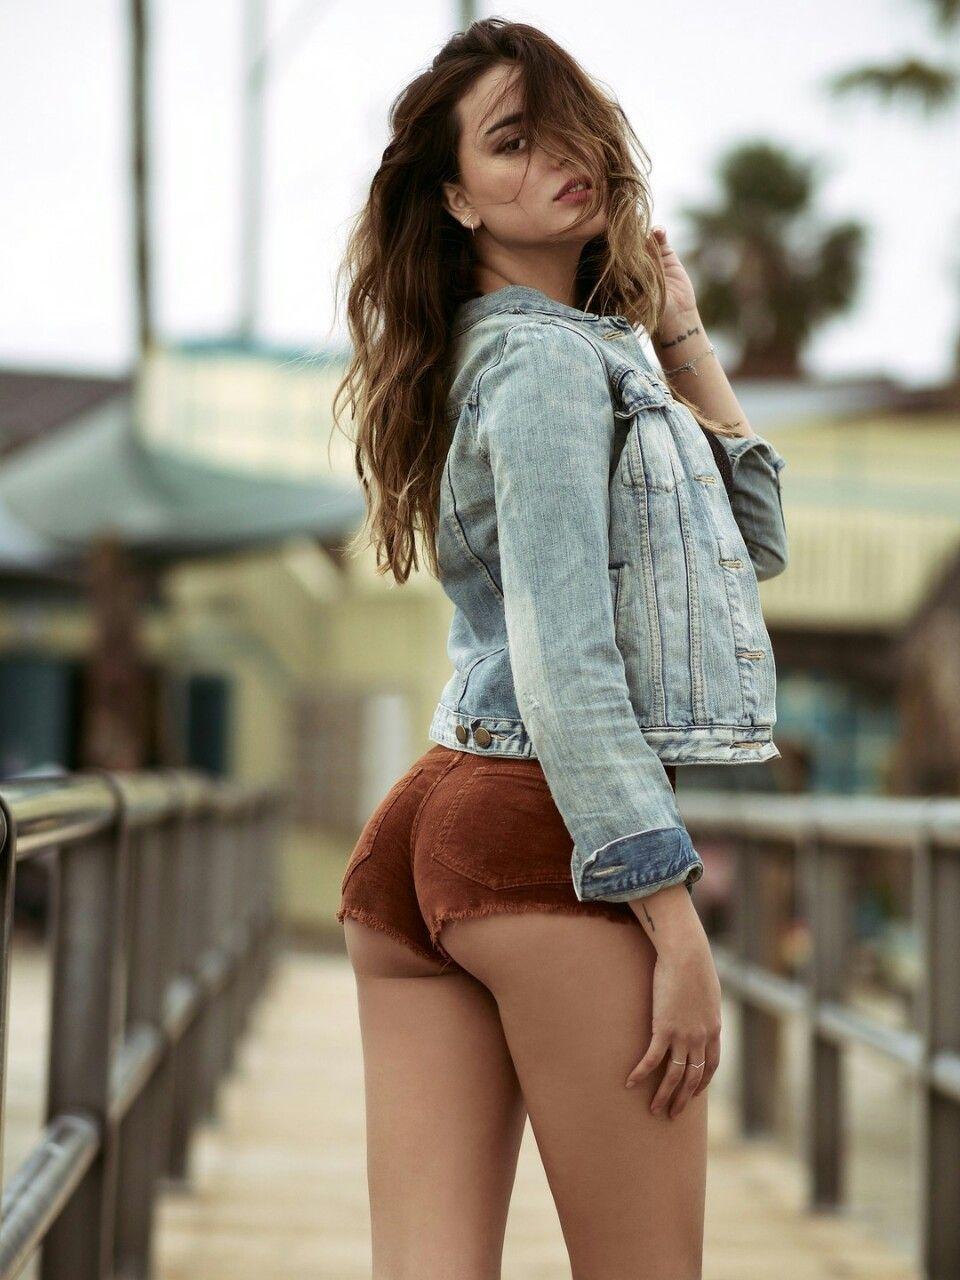 Hot Short Short Pics